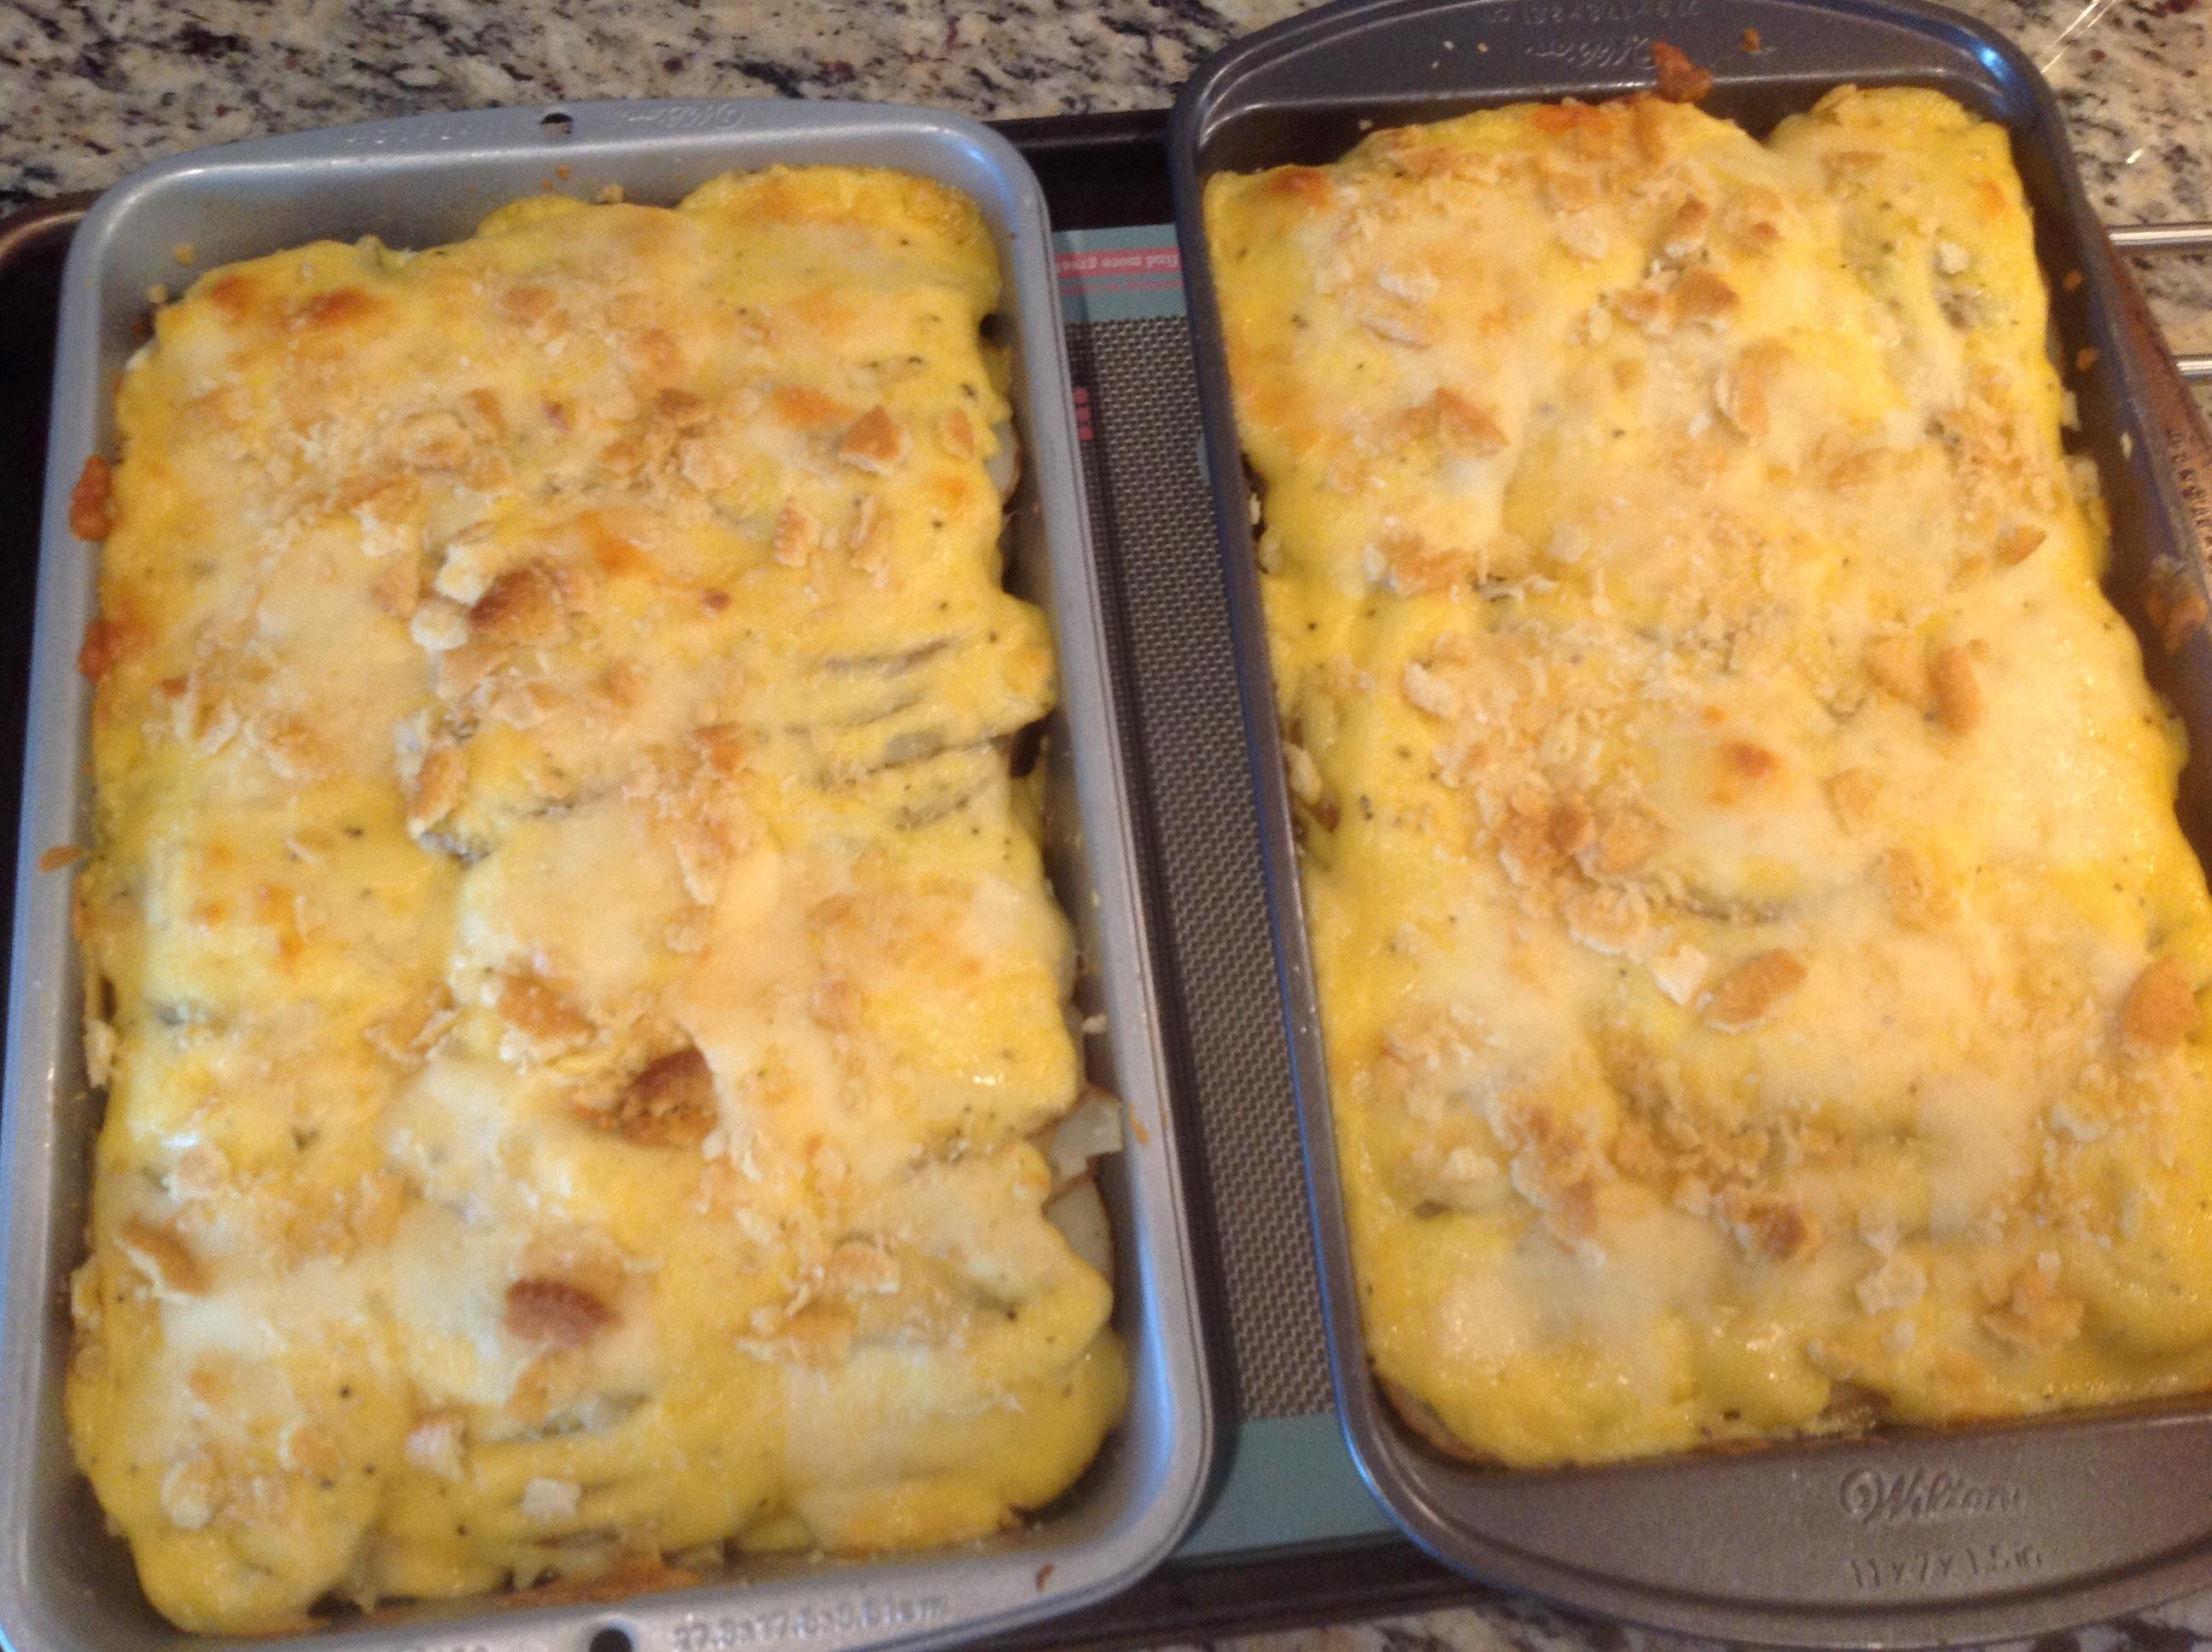 Parmesan-Crusted Au Gratin Potatoes and Onion ritakalina